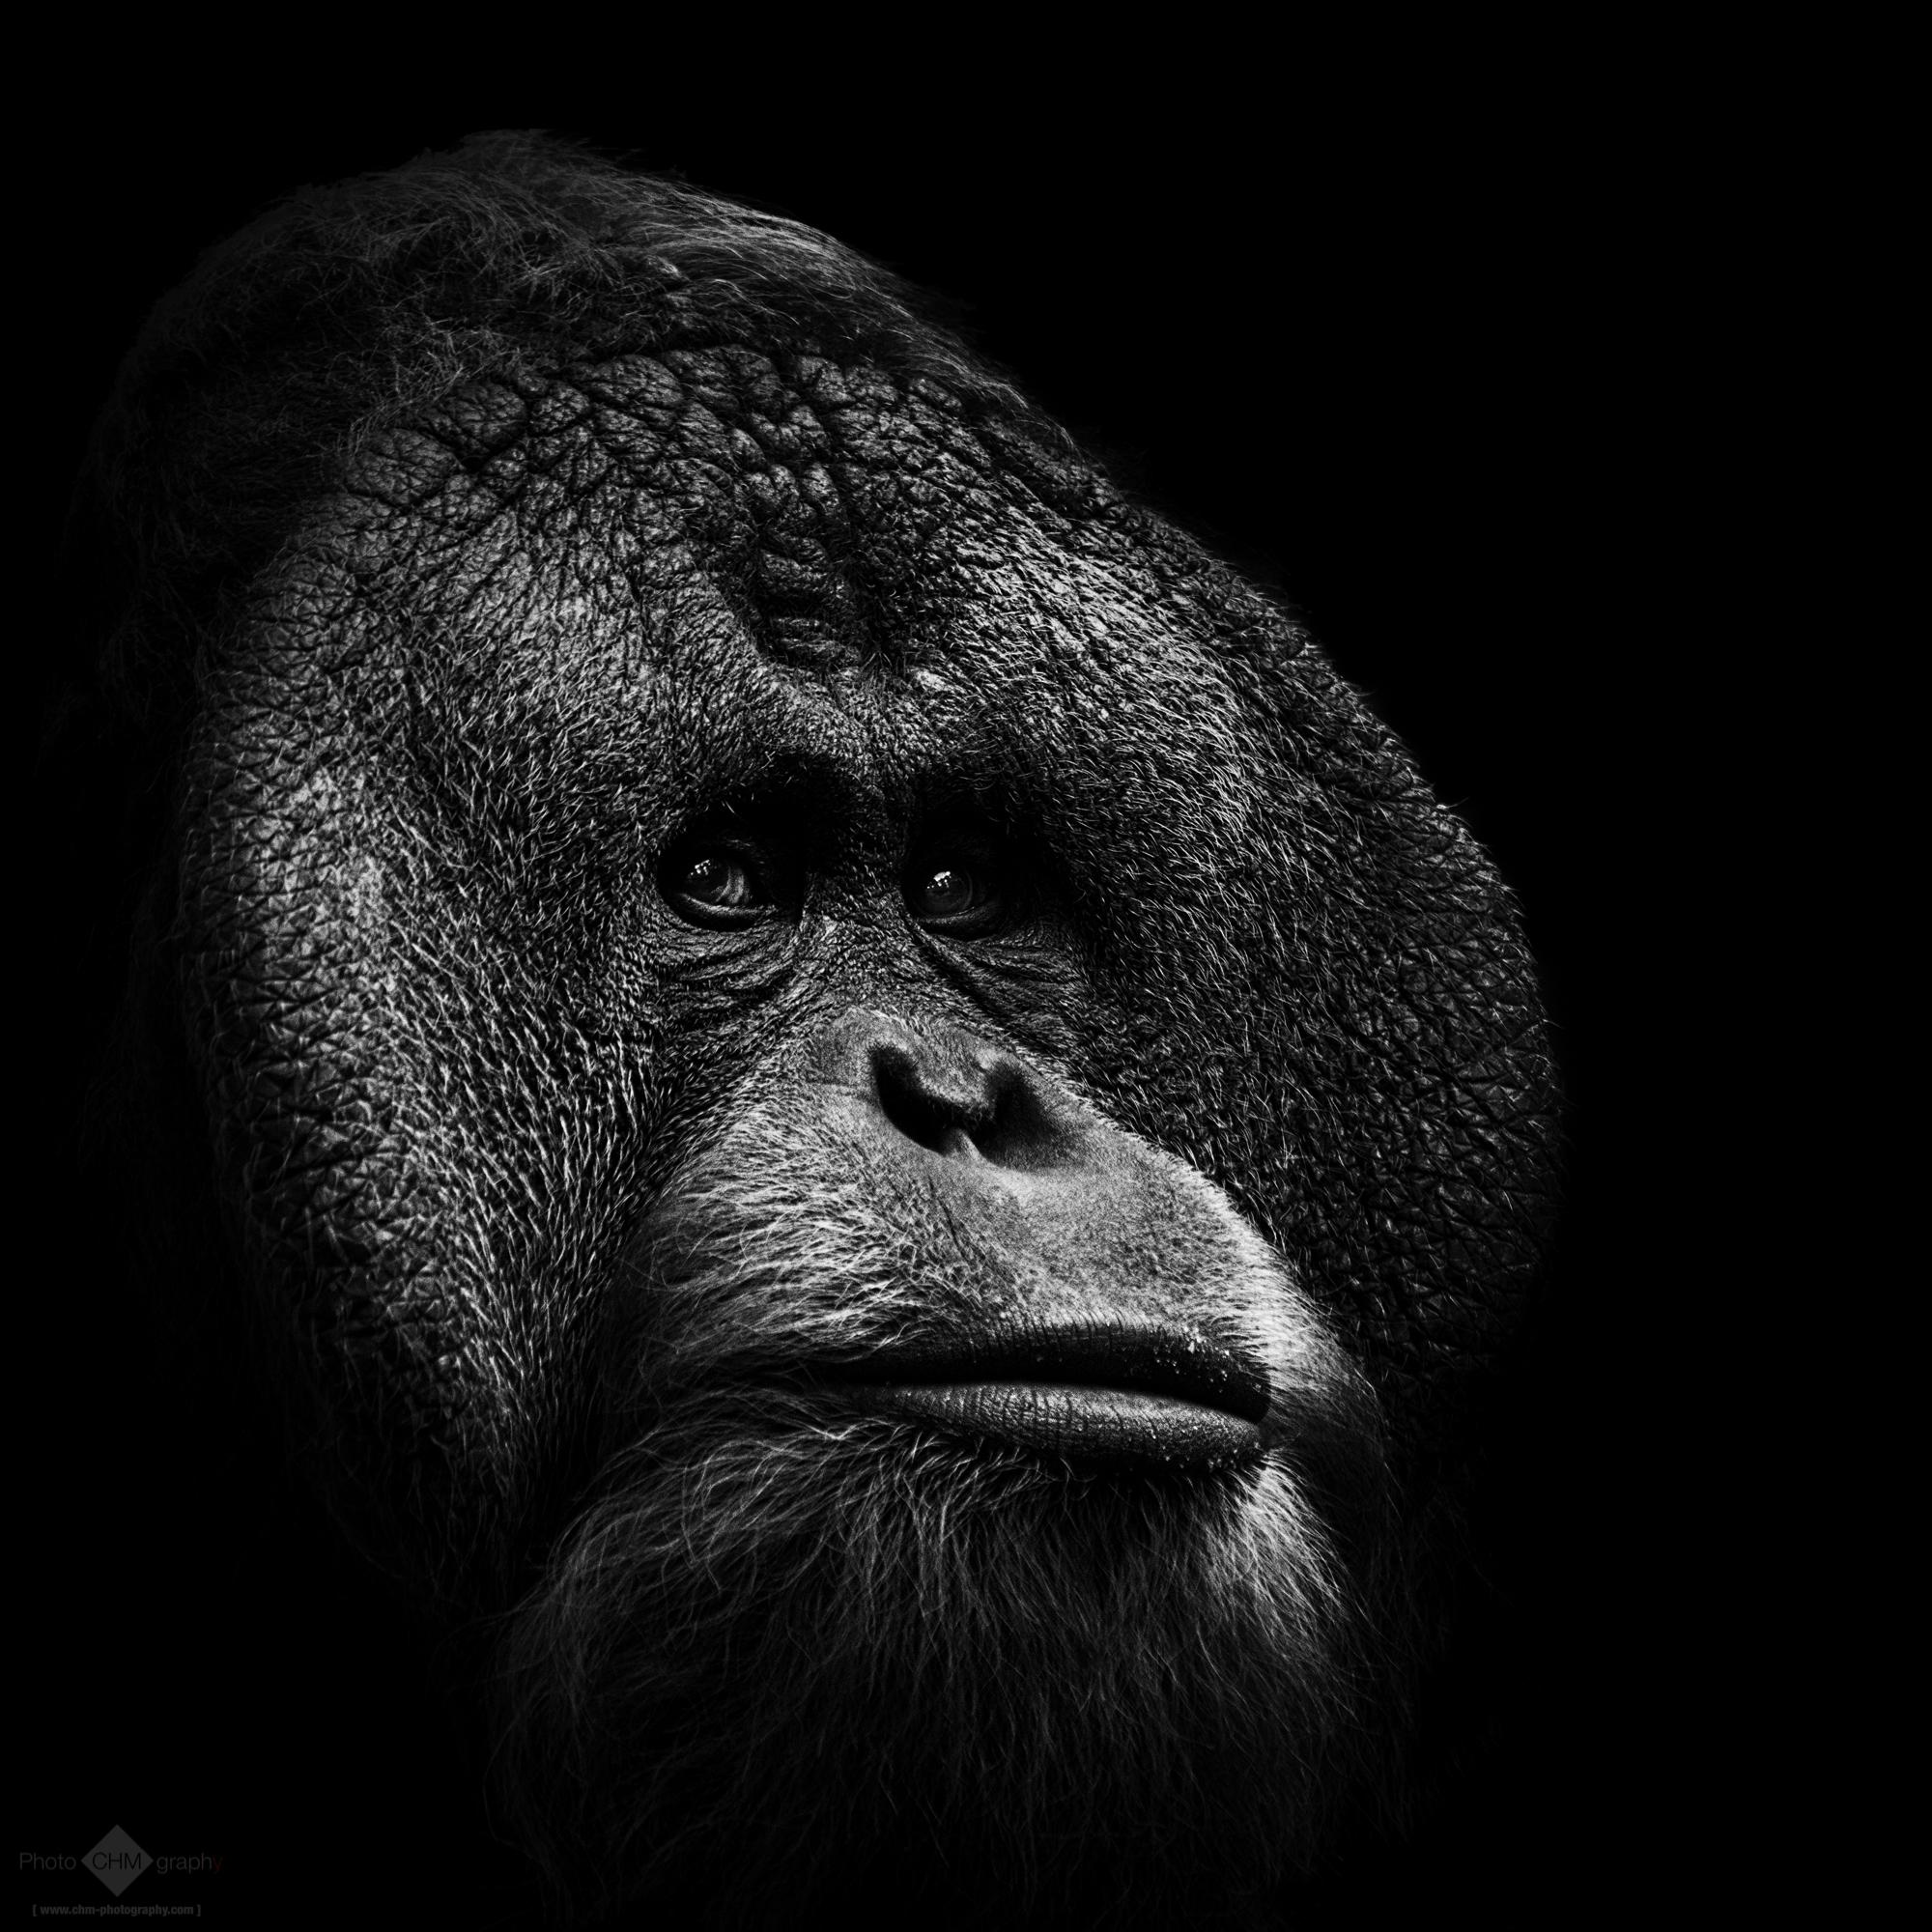 Animals (monochrome)